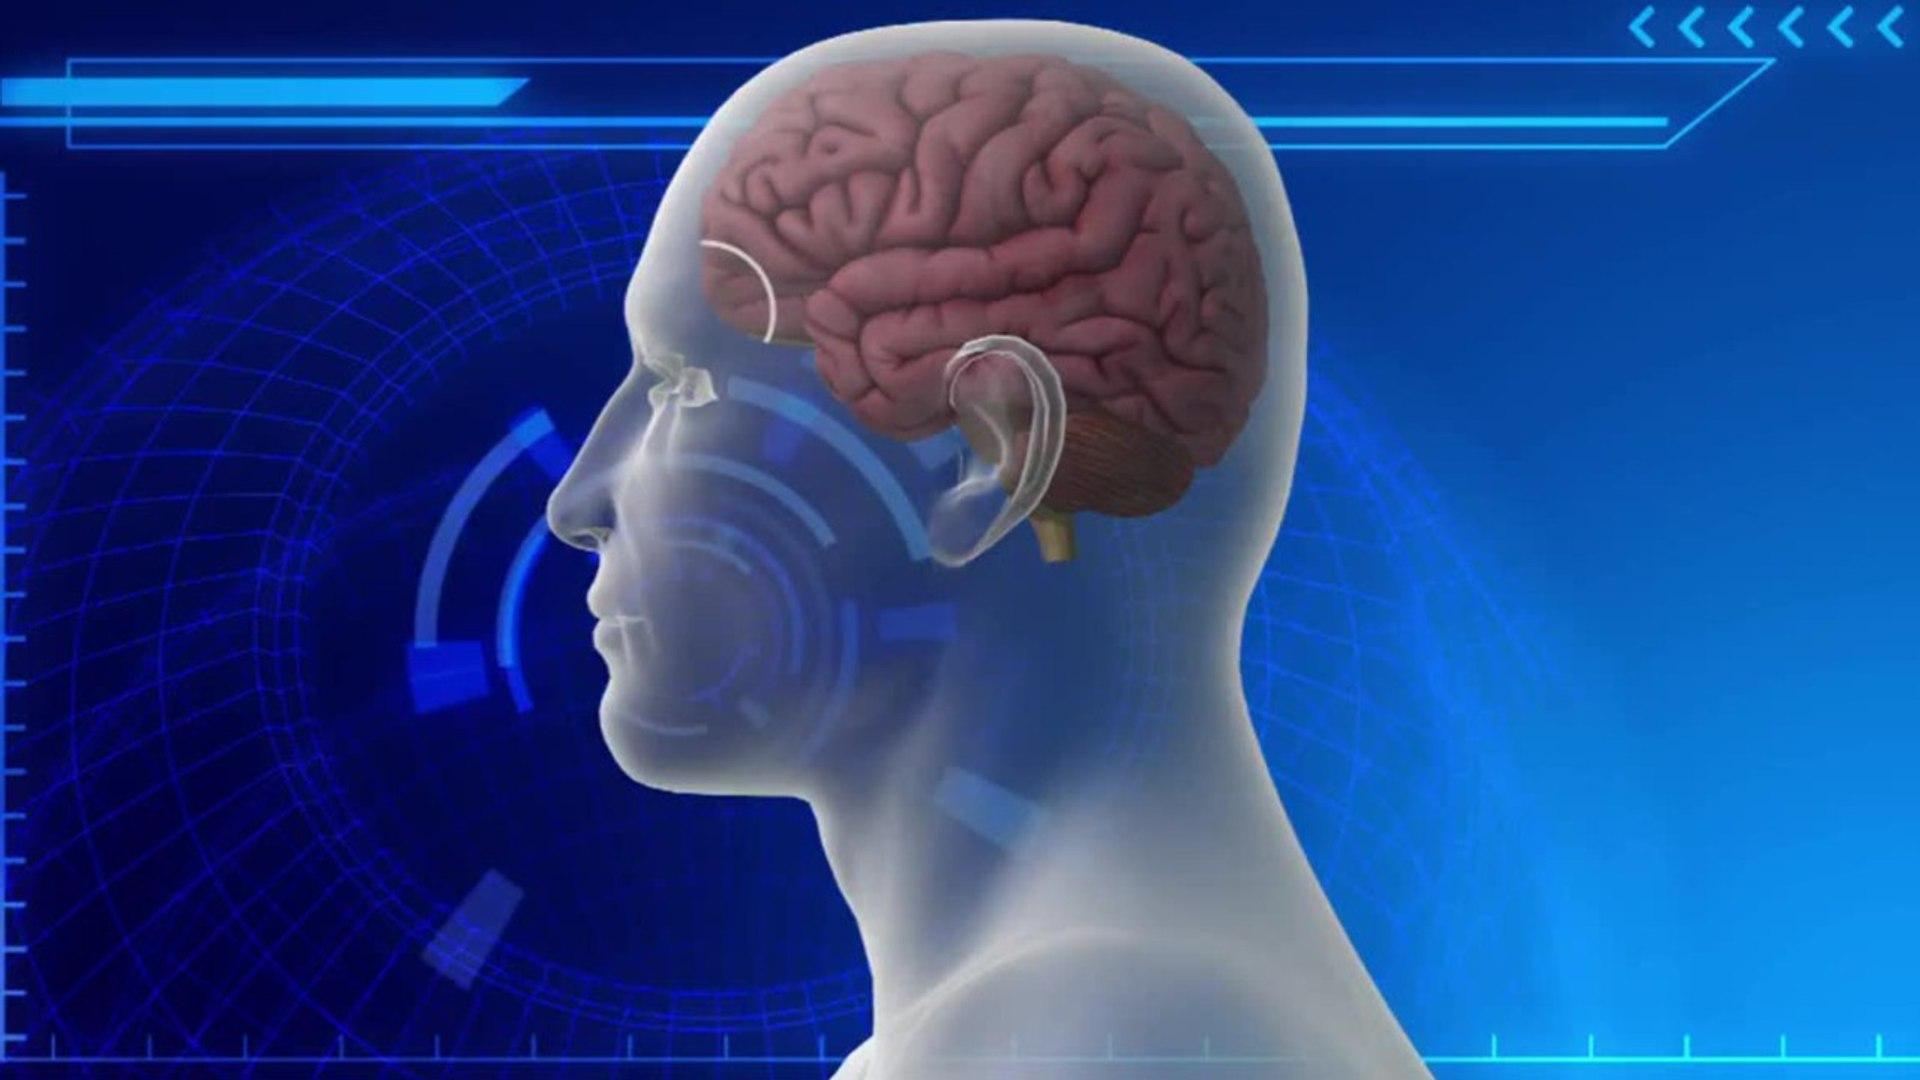 Brain Trauma in 99% of Dead NFL players